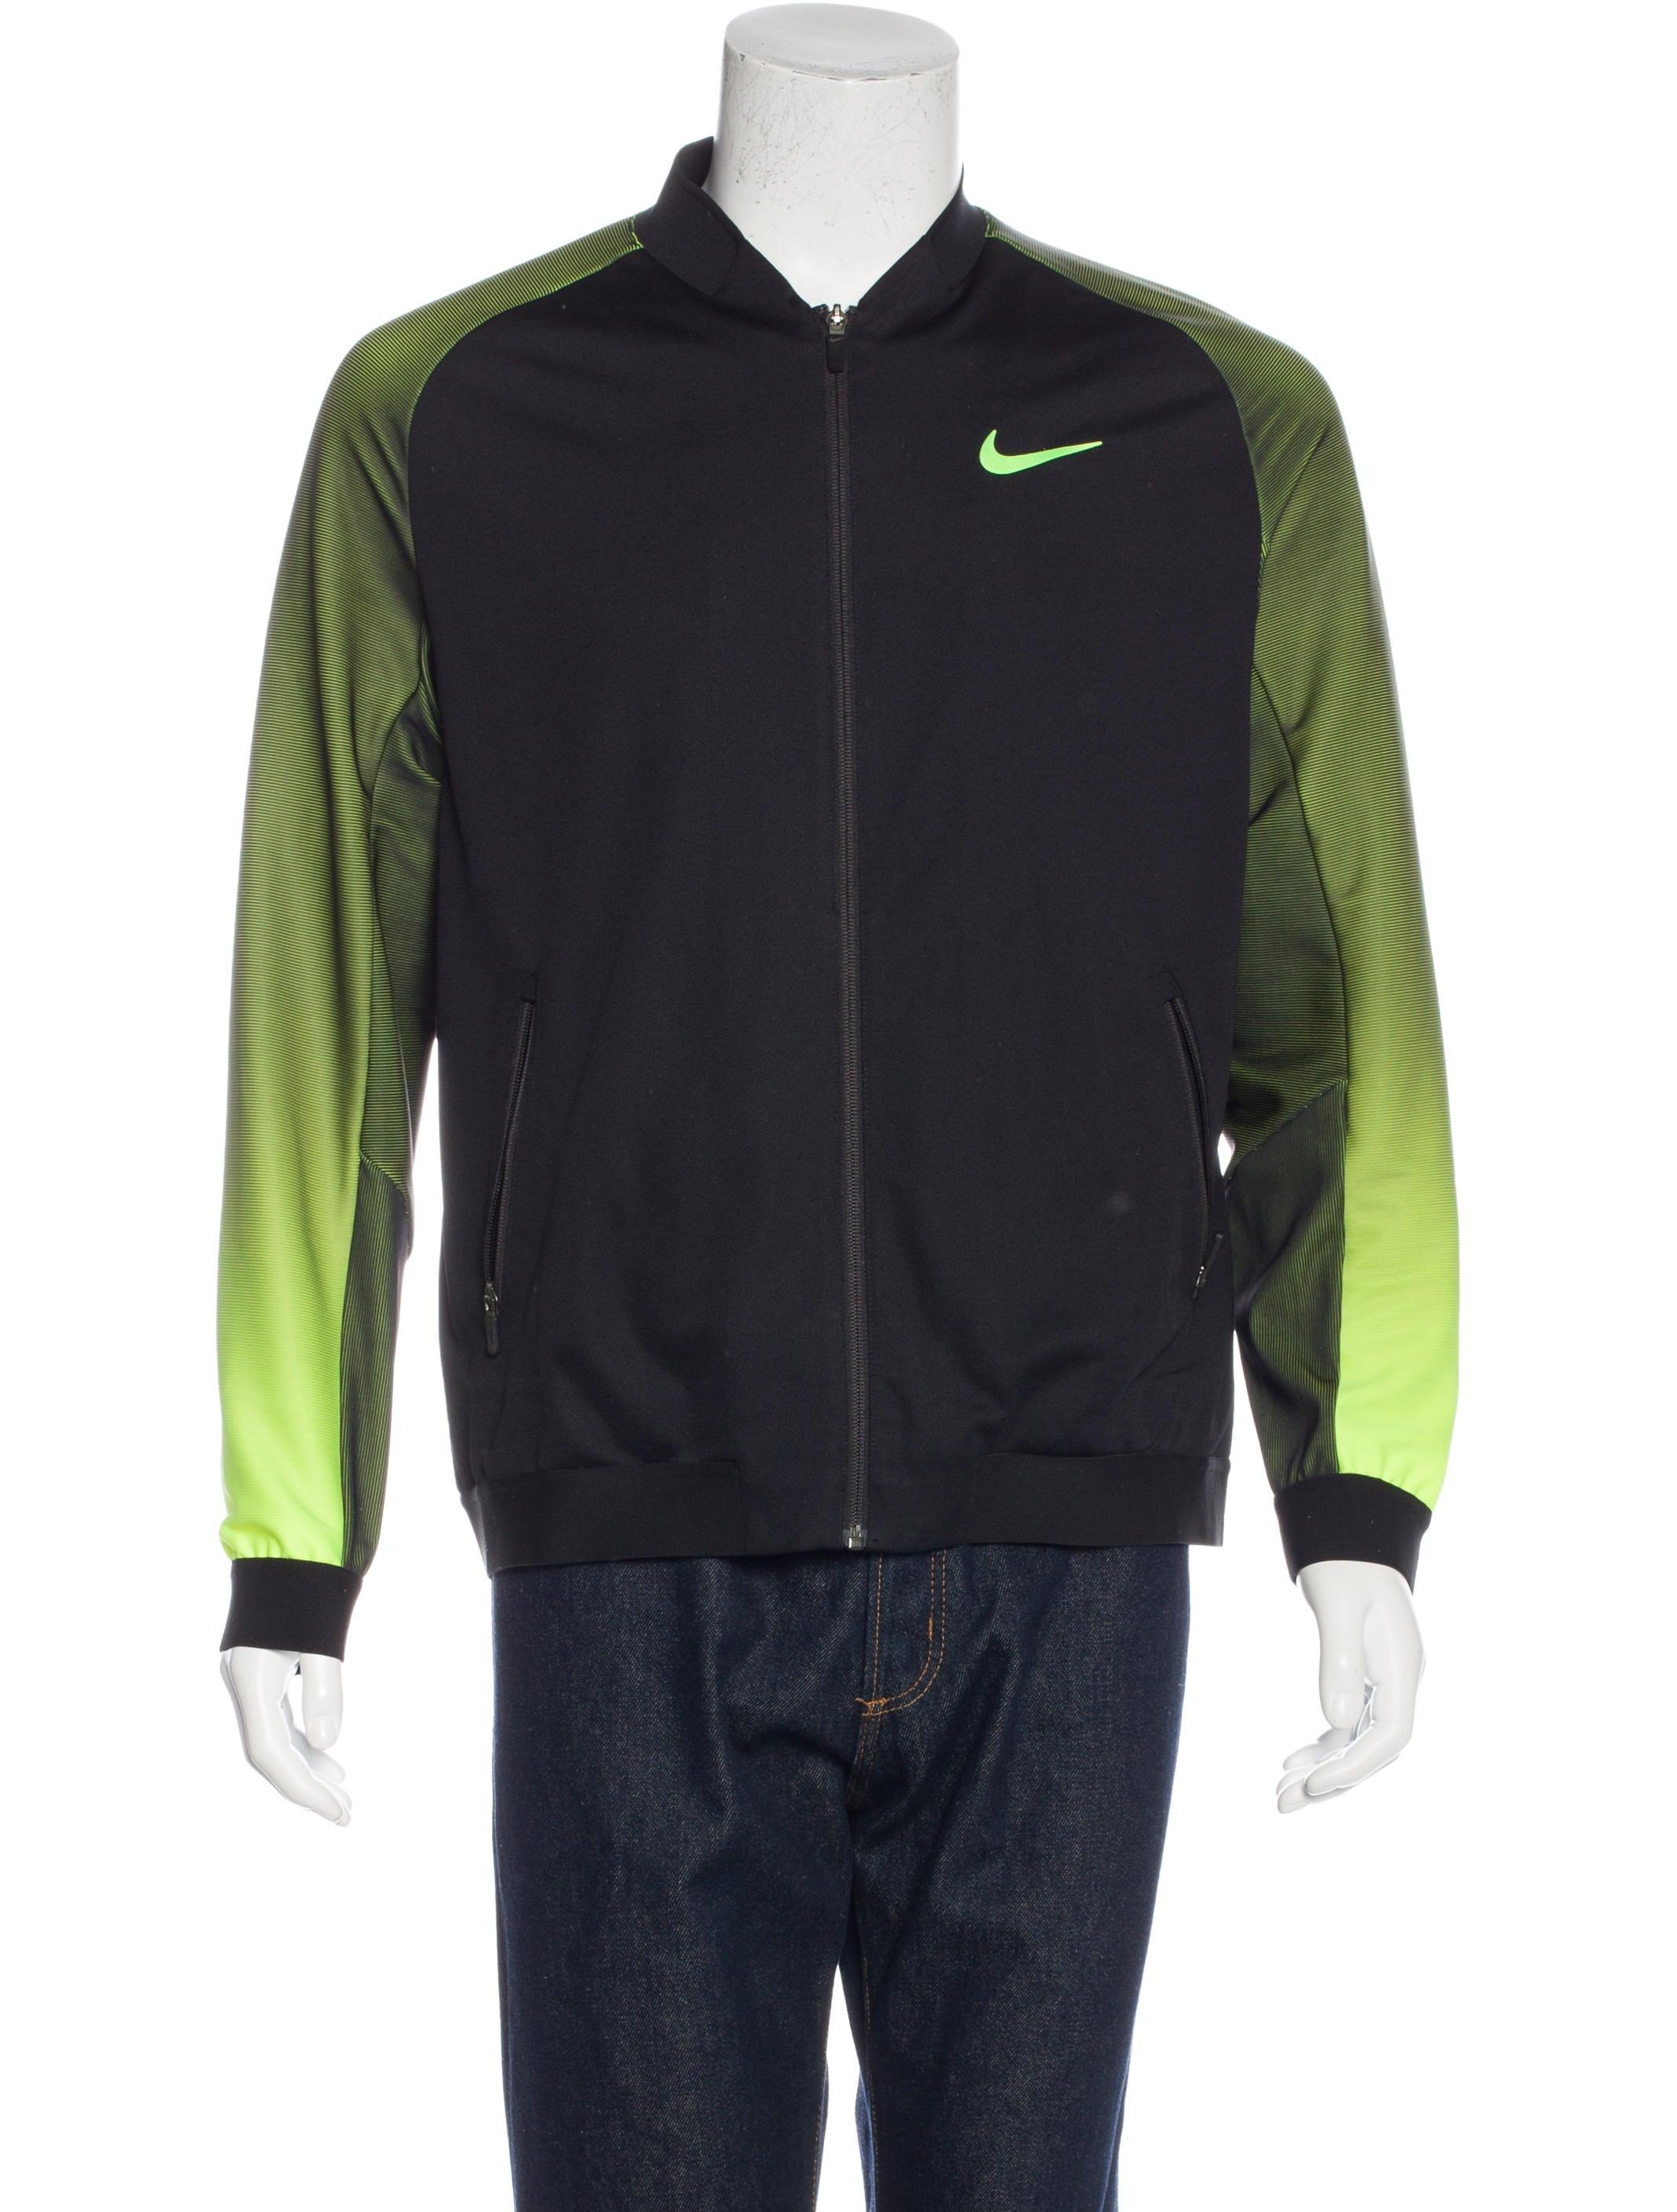 Nike Logo Zip Jacket - Clothing - WU221119 | The RealReal